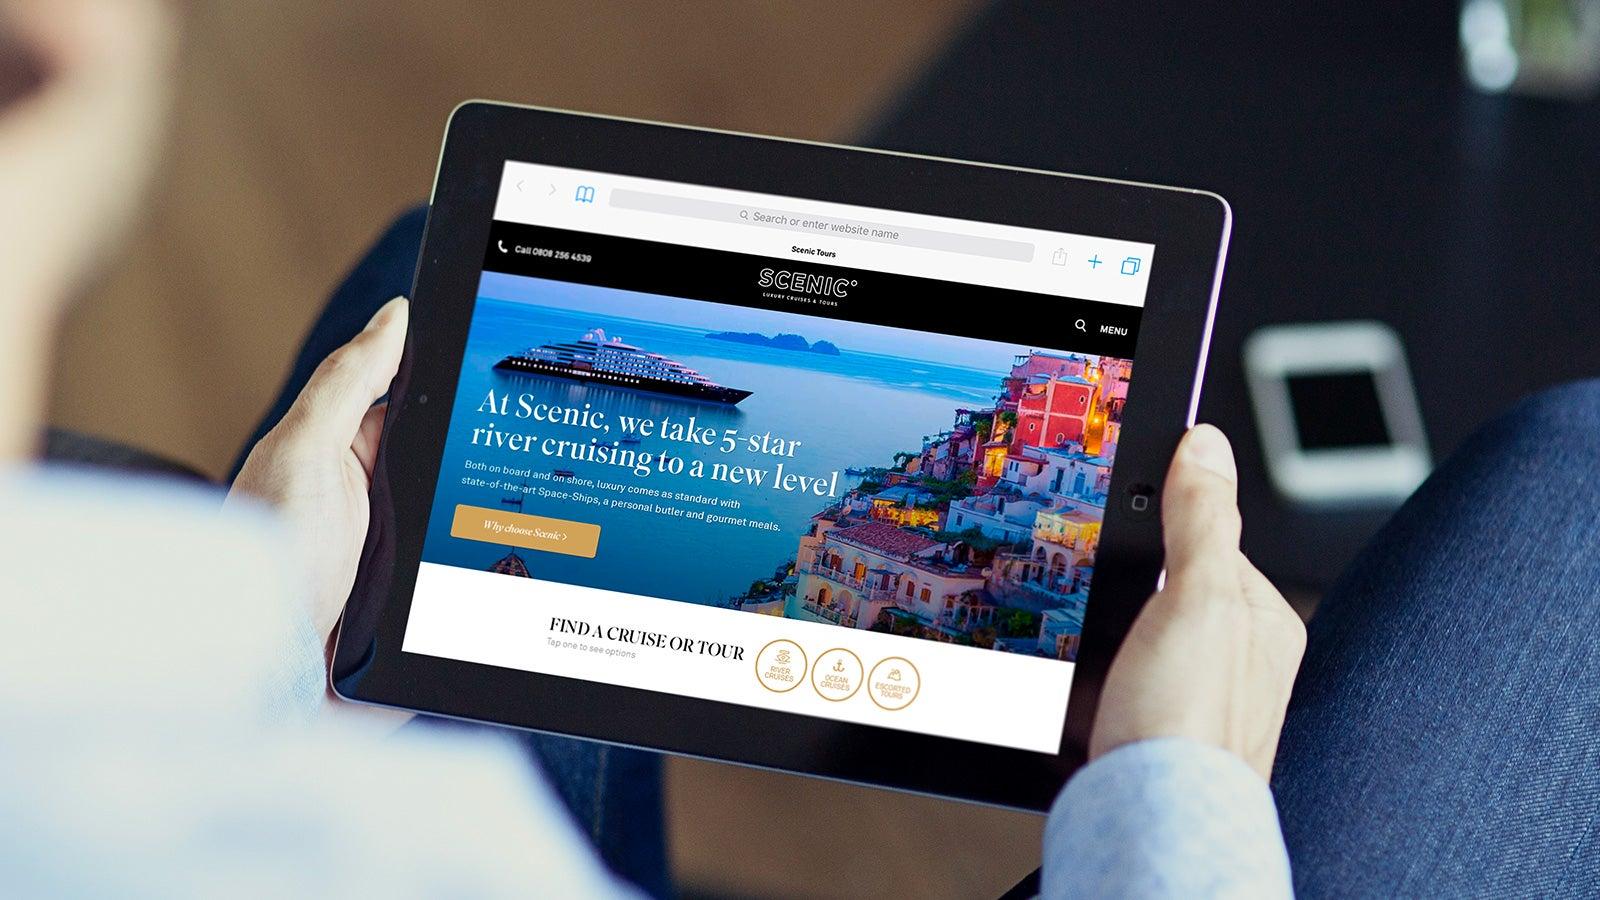 Scenic | Scenic website homepage on iPad | Devotion